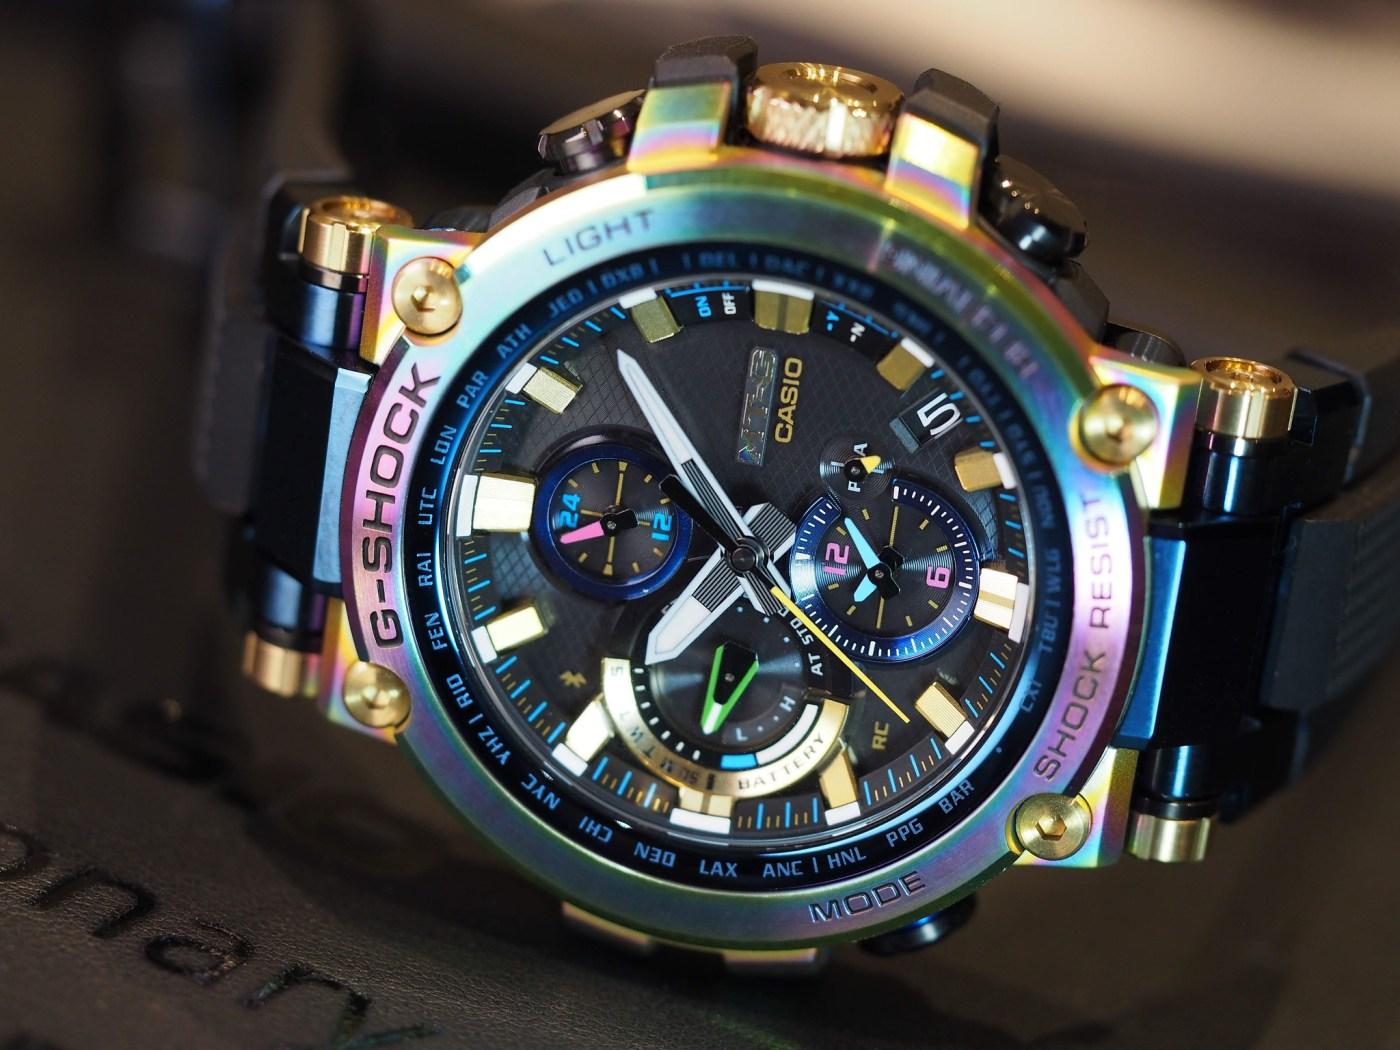 G-Shock MT-G MTGB1000RB-2A